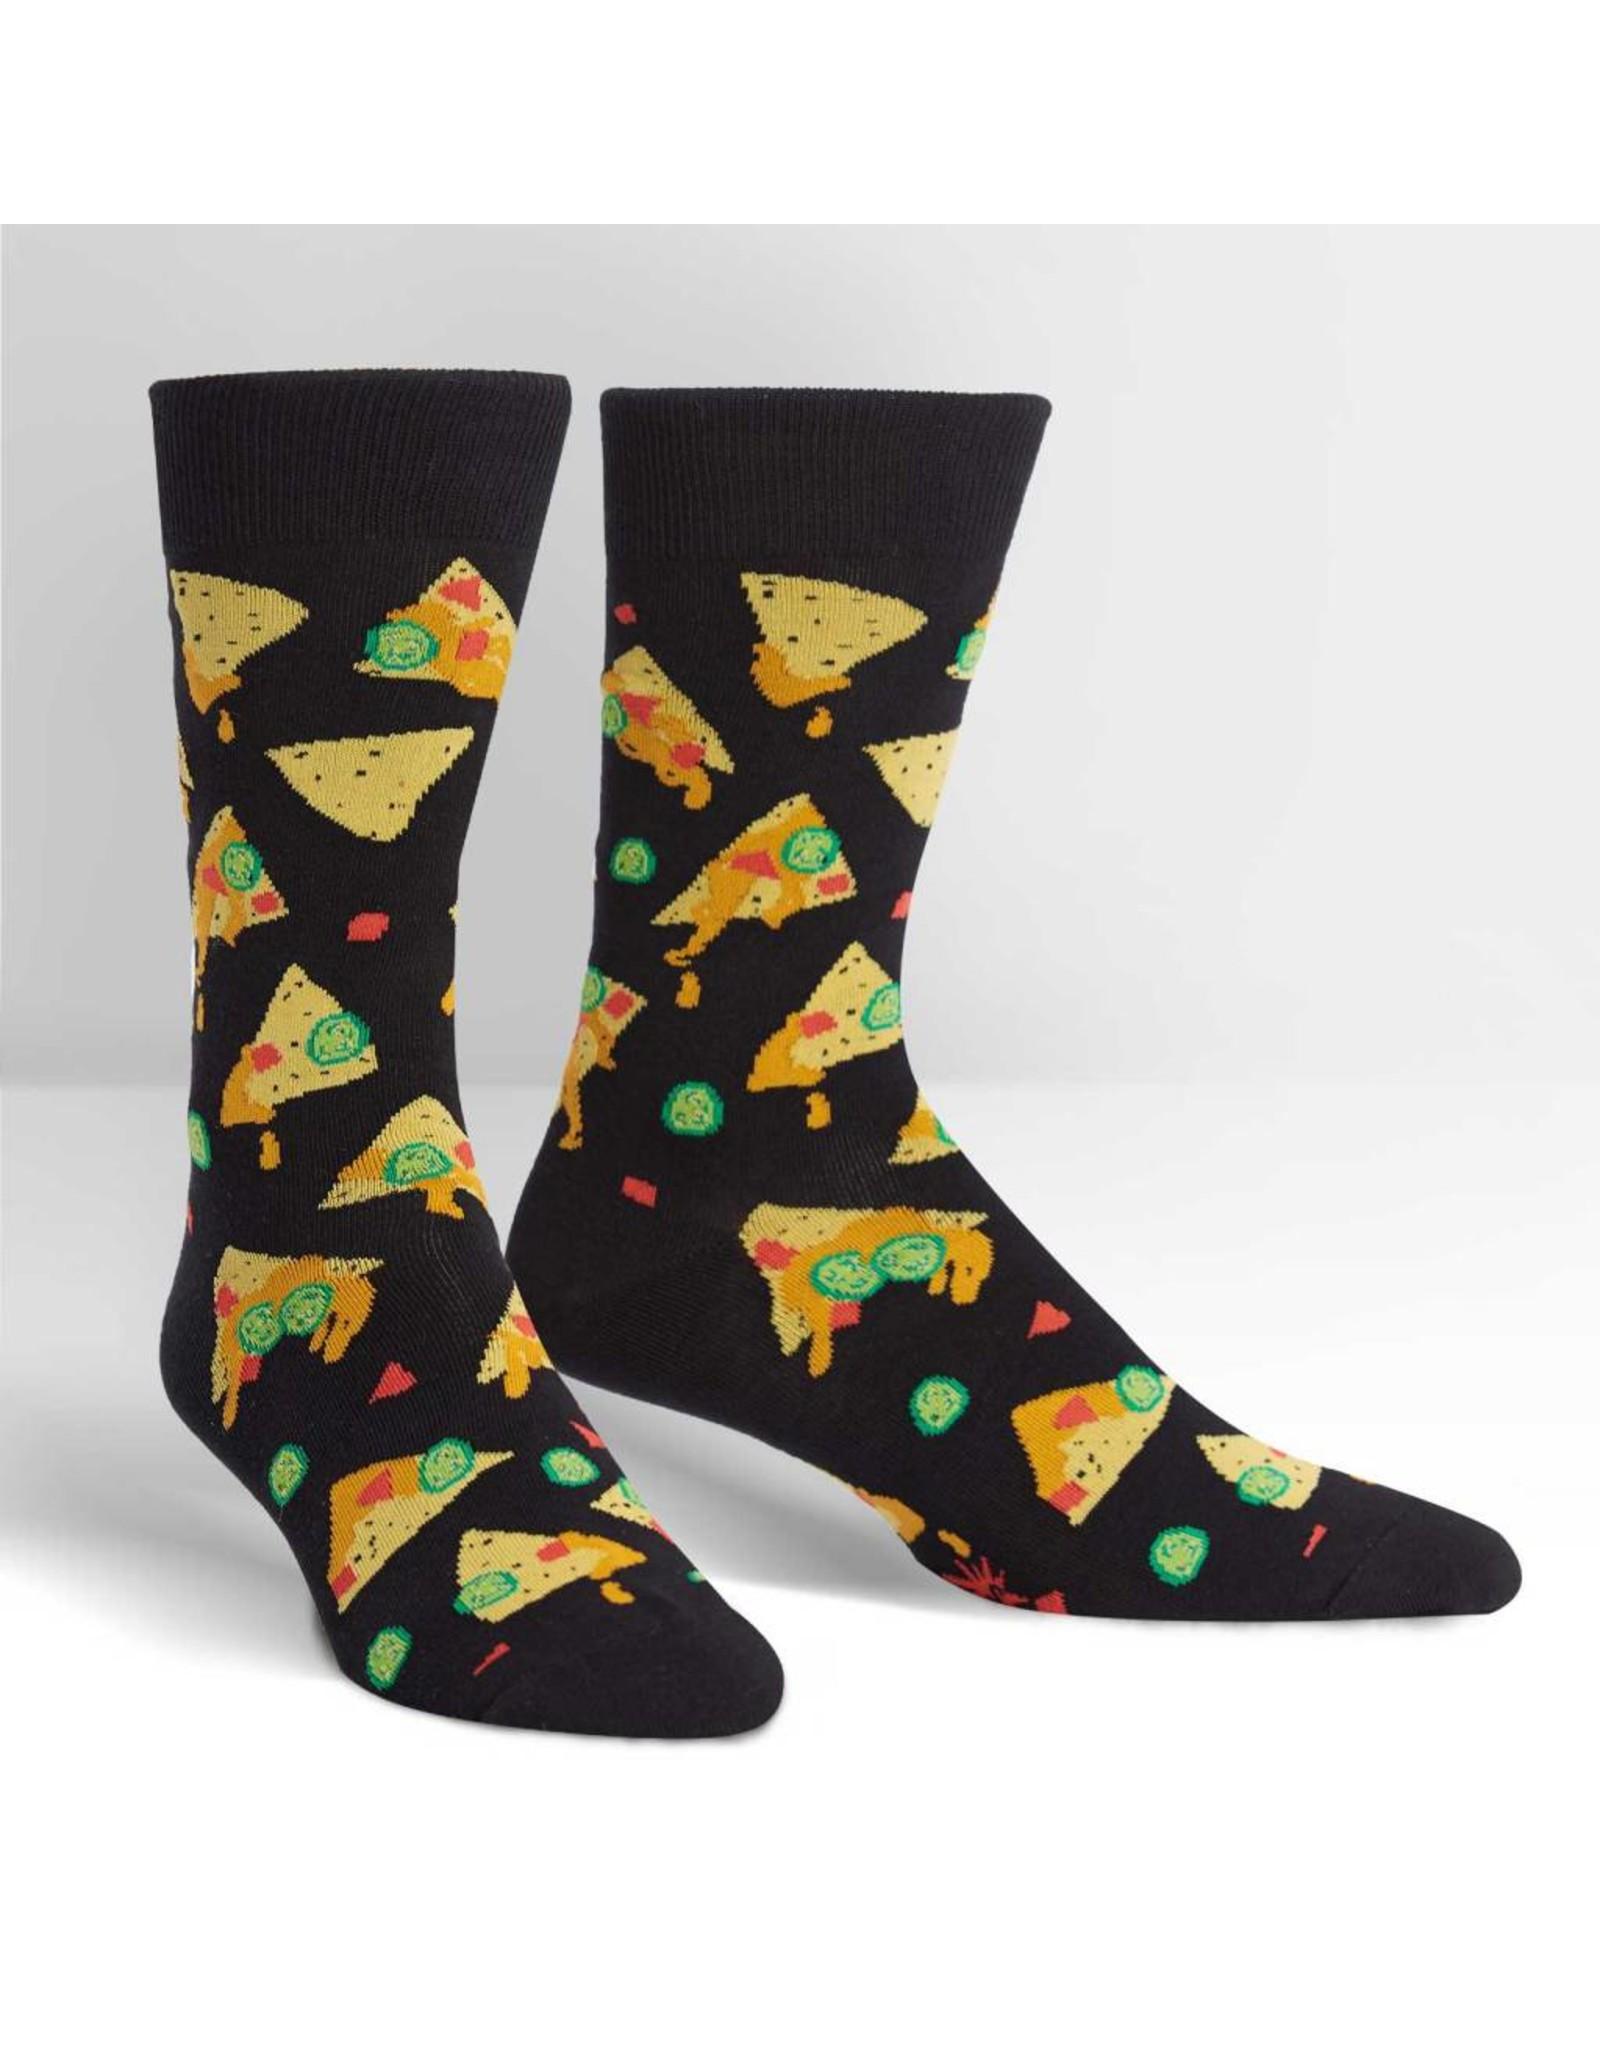 SOCK IT TO ME - Men's Nacho, Nacho Man Crew Socks